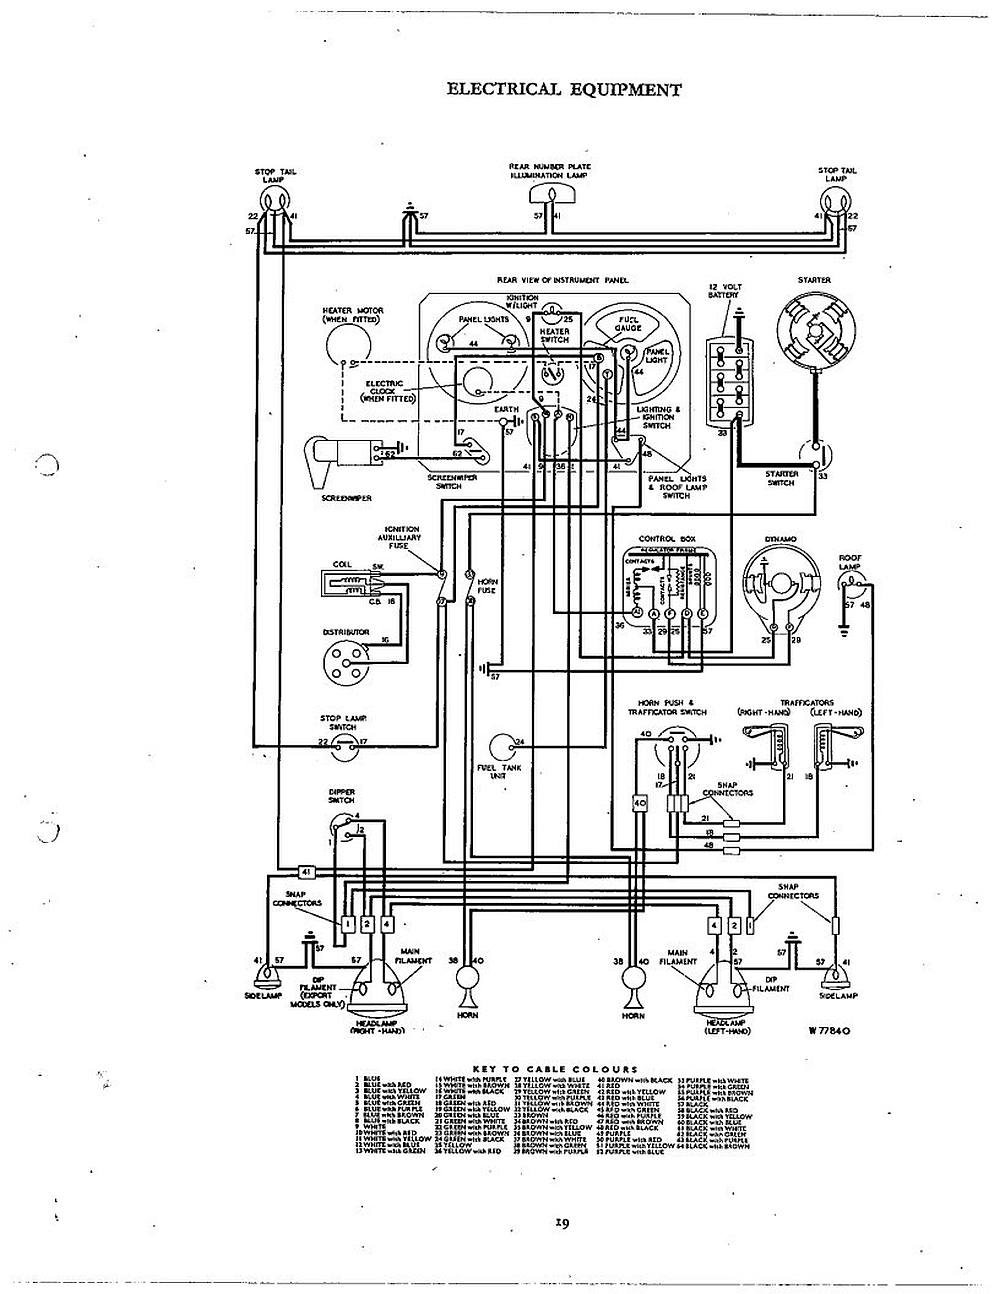 car wiring diagrams uk human leg bone anatomy diagram triumph service manuals vitessesteve mayflower